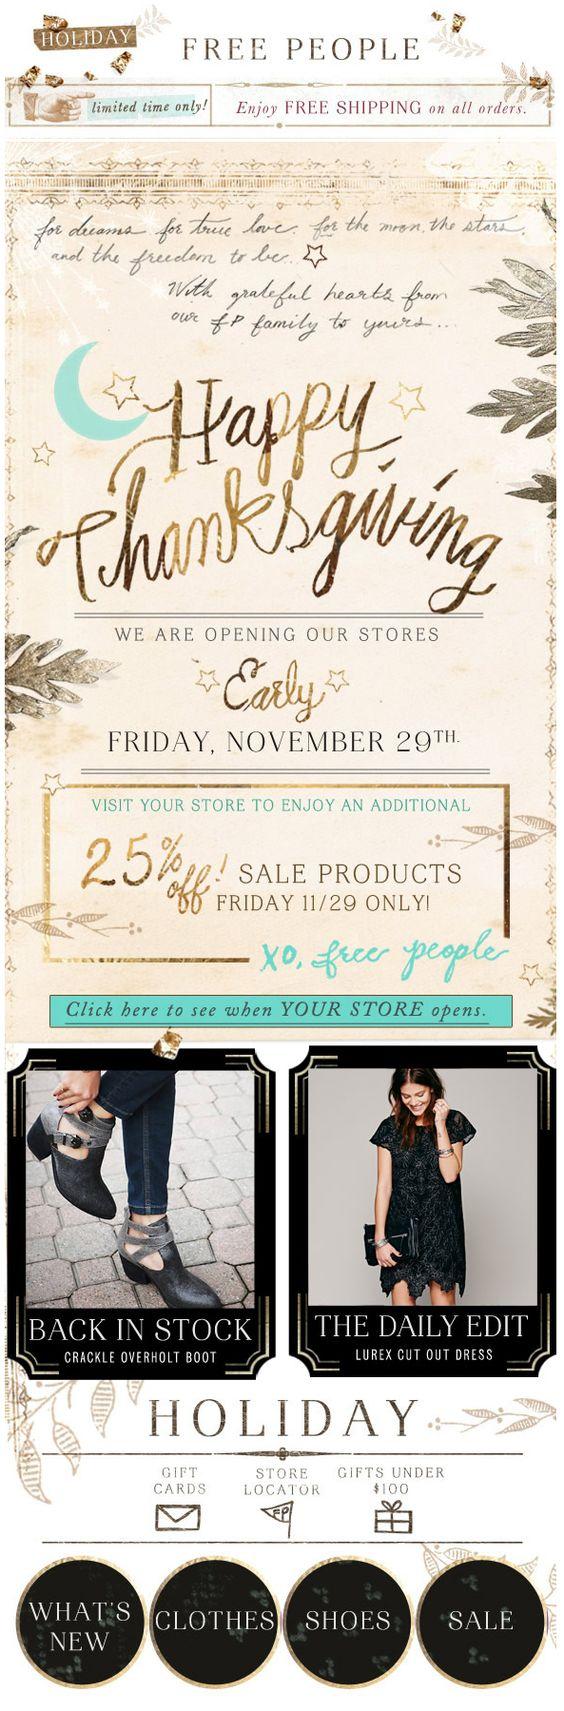 Free People : Happy Thanksgiving + Promo